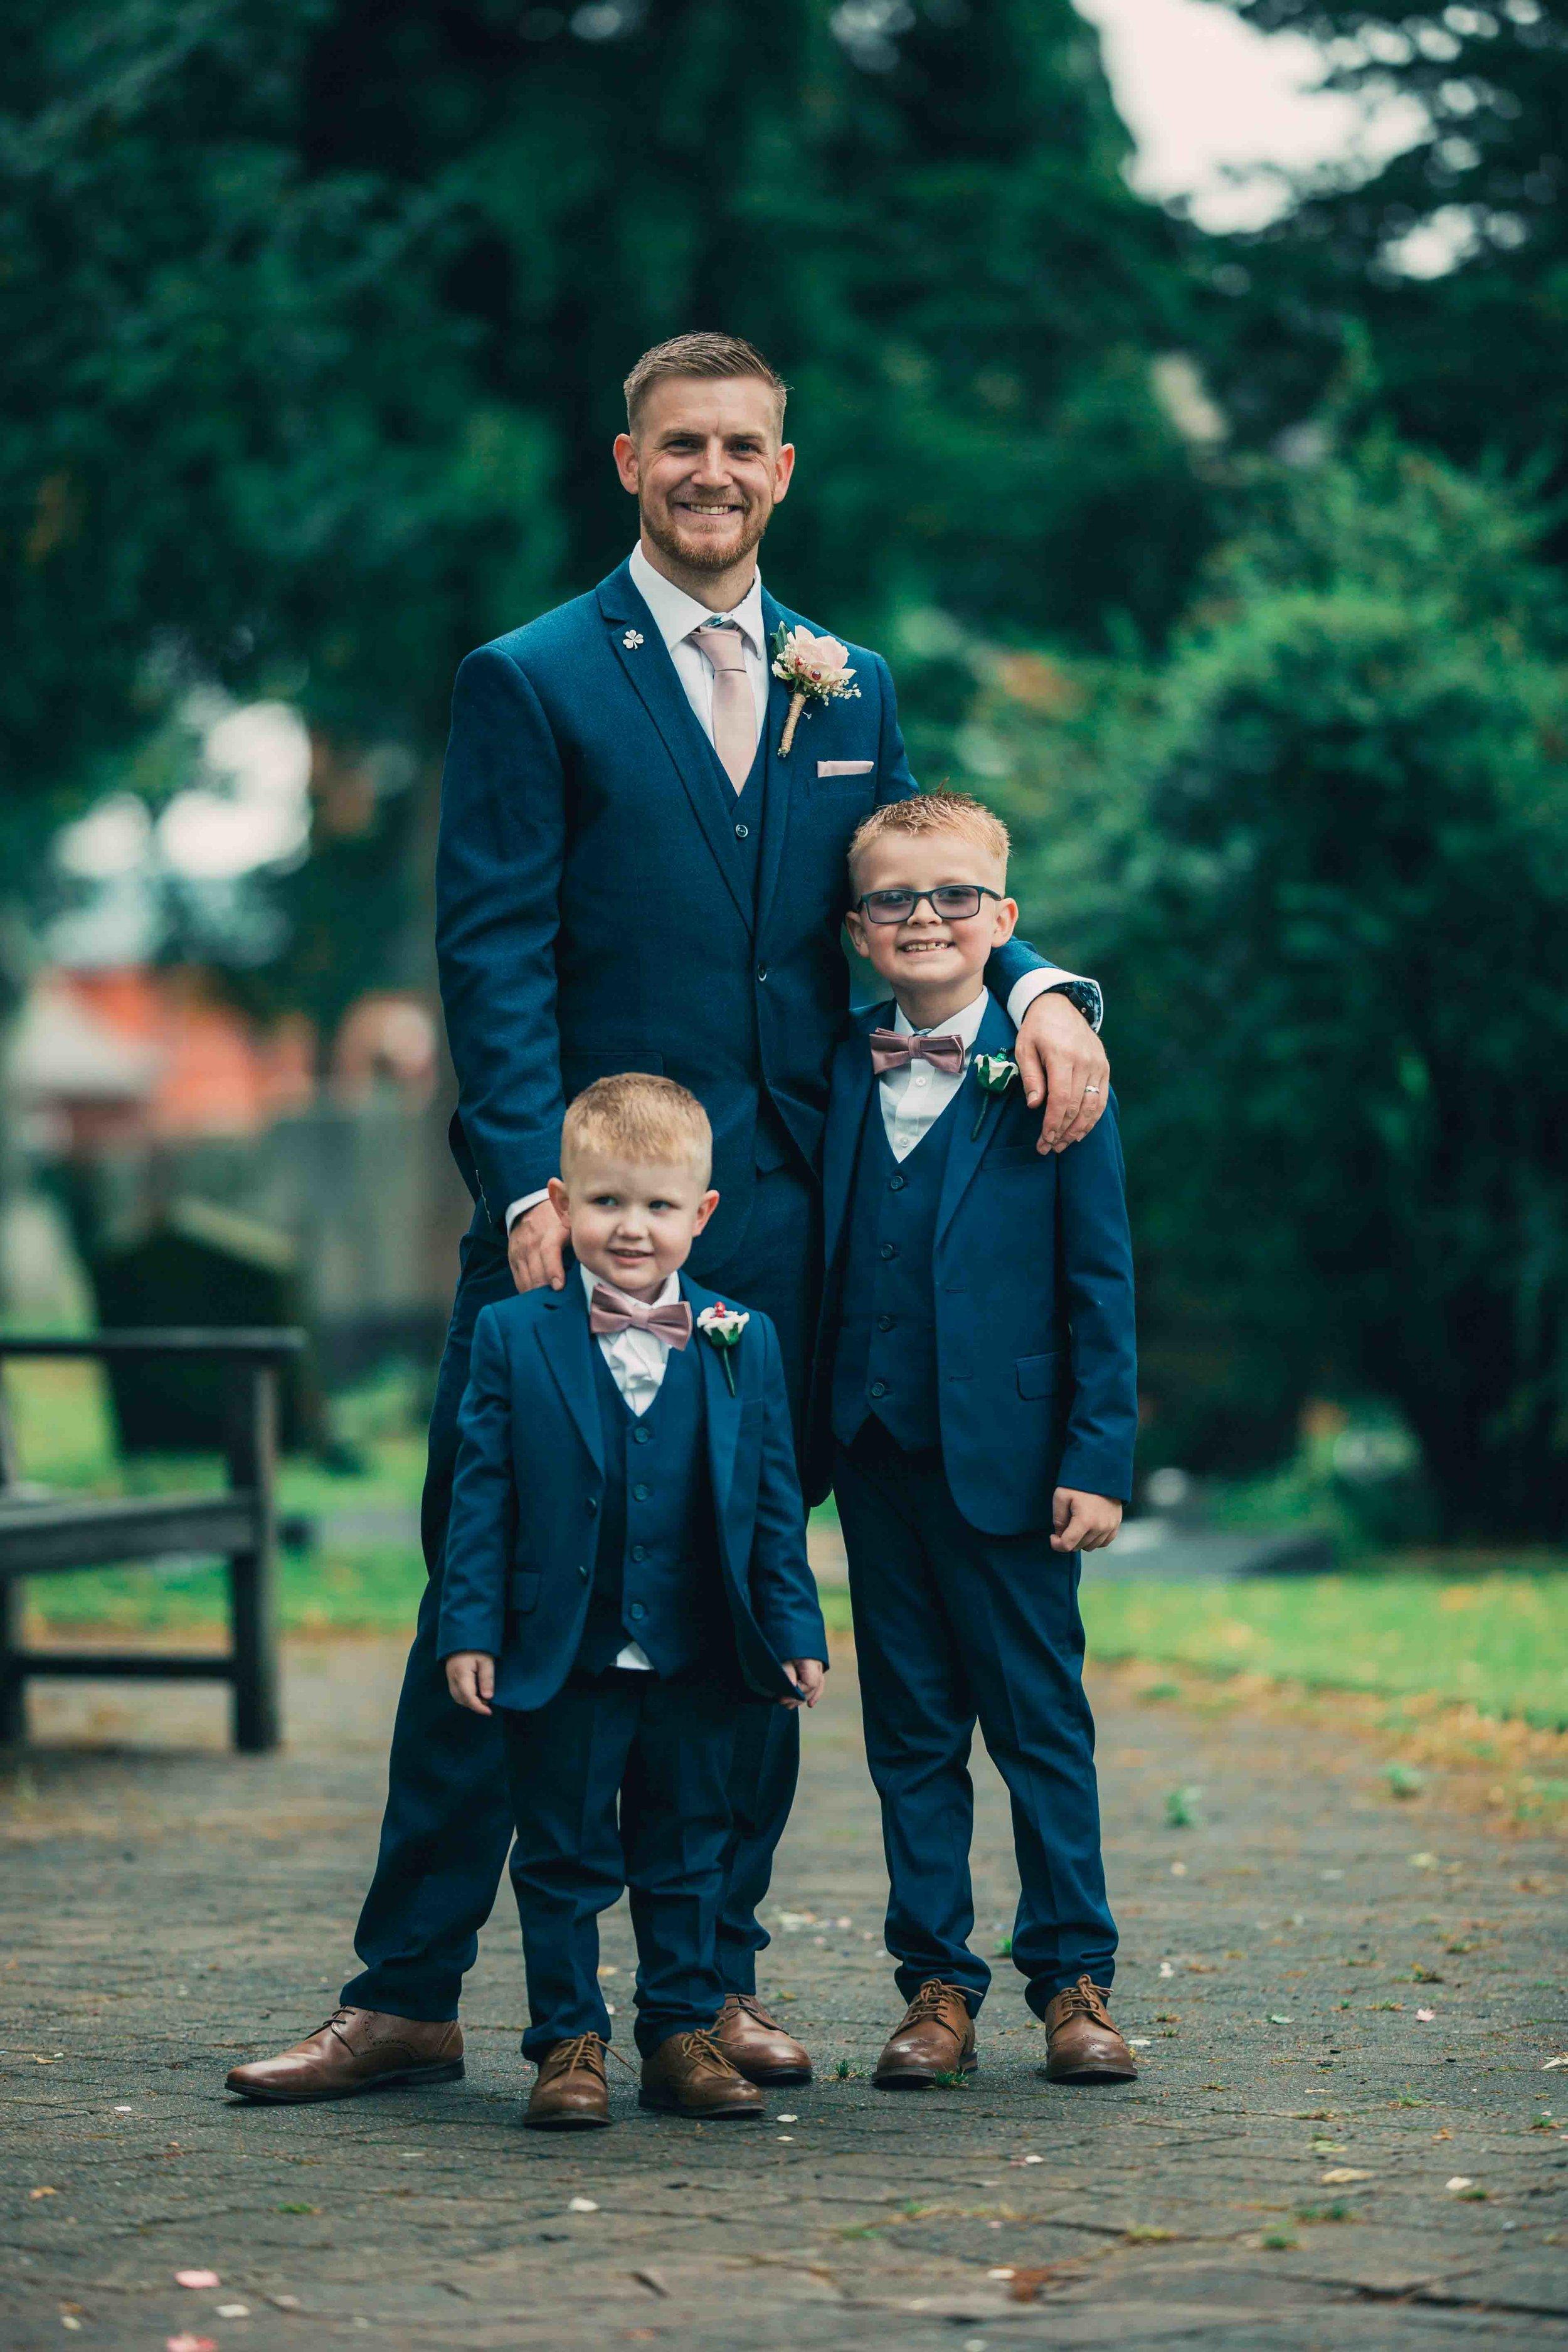 Lea-cooper-photography-willenhall-wolverhampton-wedding-photographer-birmingham-shirley-west-midlands-ceremony-church-23.JPG